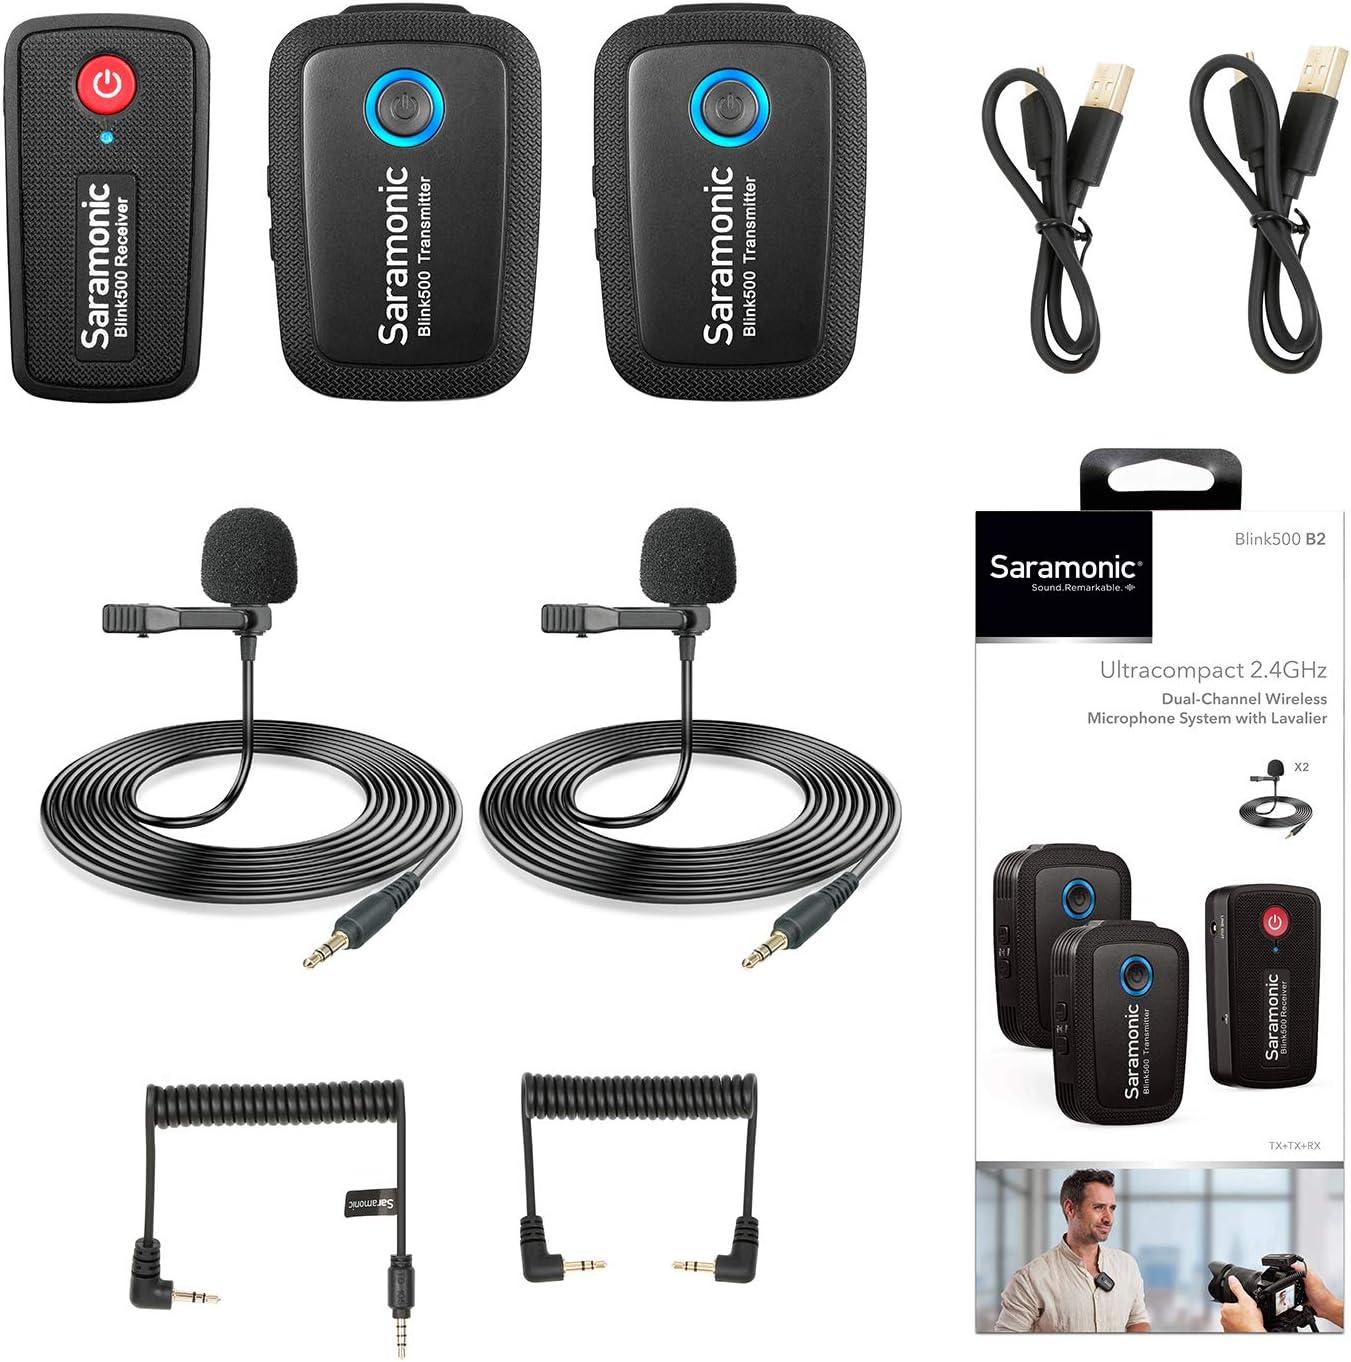 Saramonic Ultracompact 2.4GHz Popular Dual-Channel B Microphone Wireless Tulsa Mall